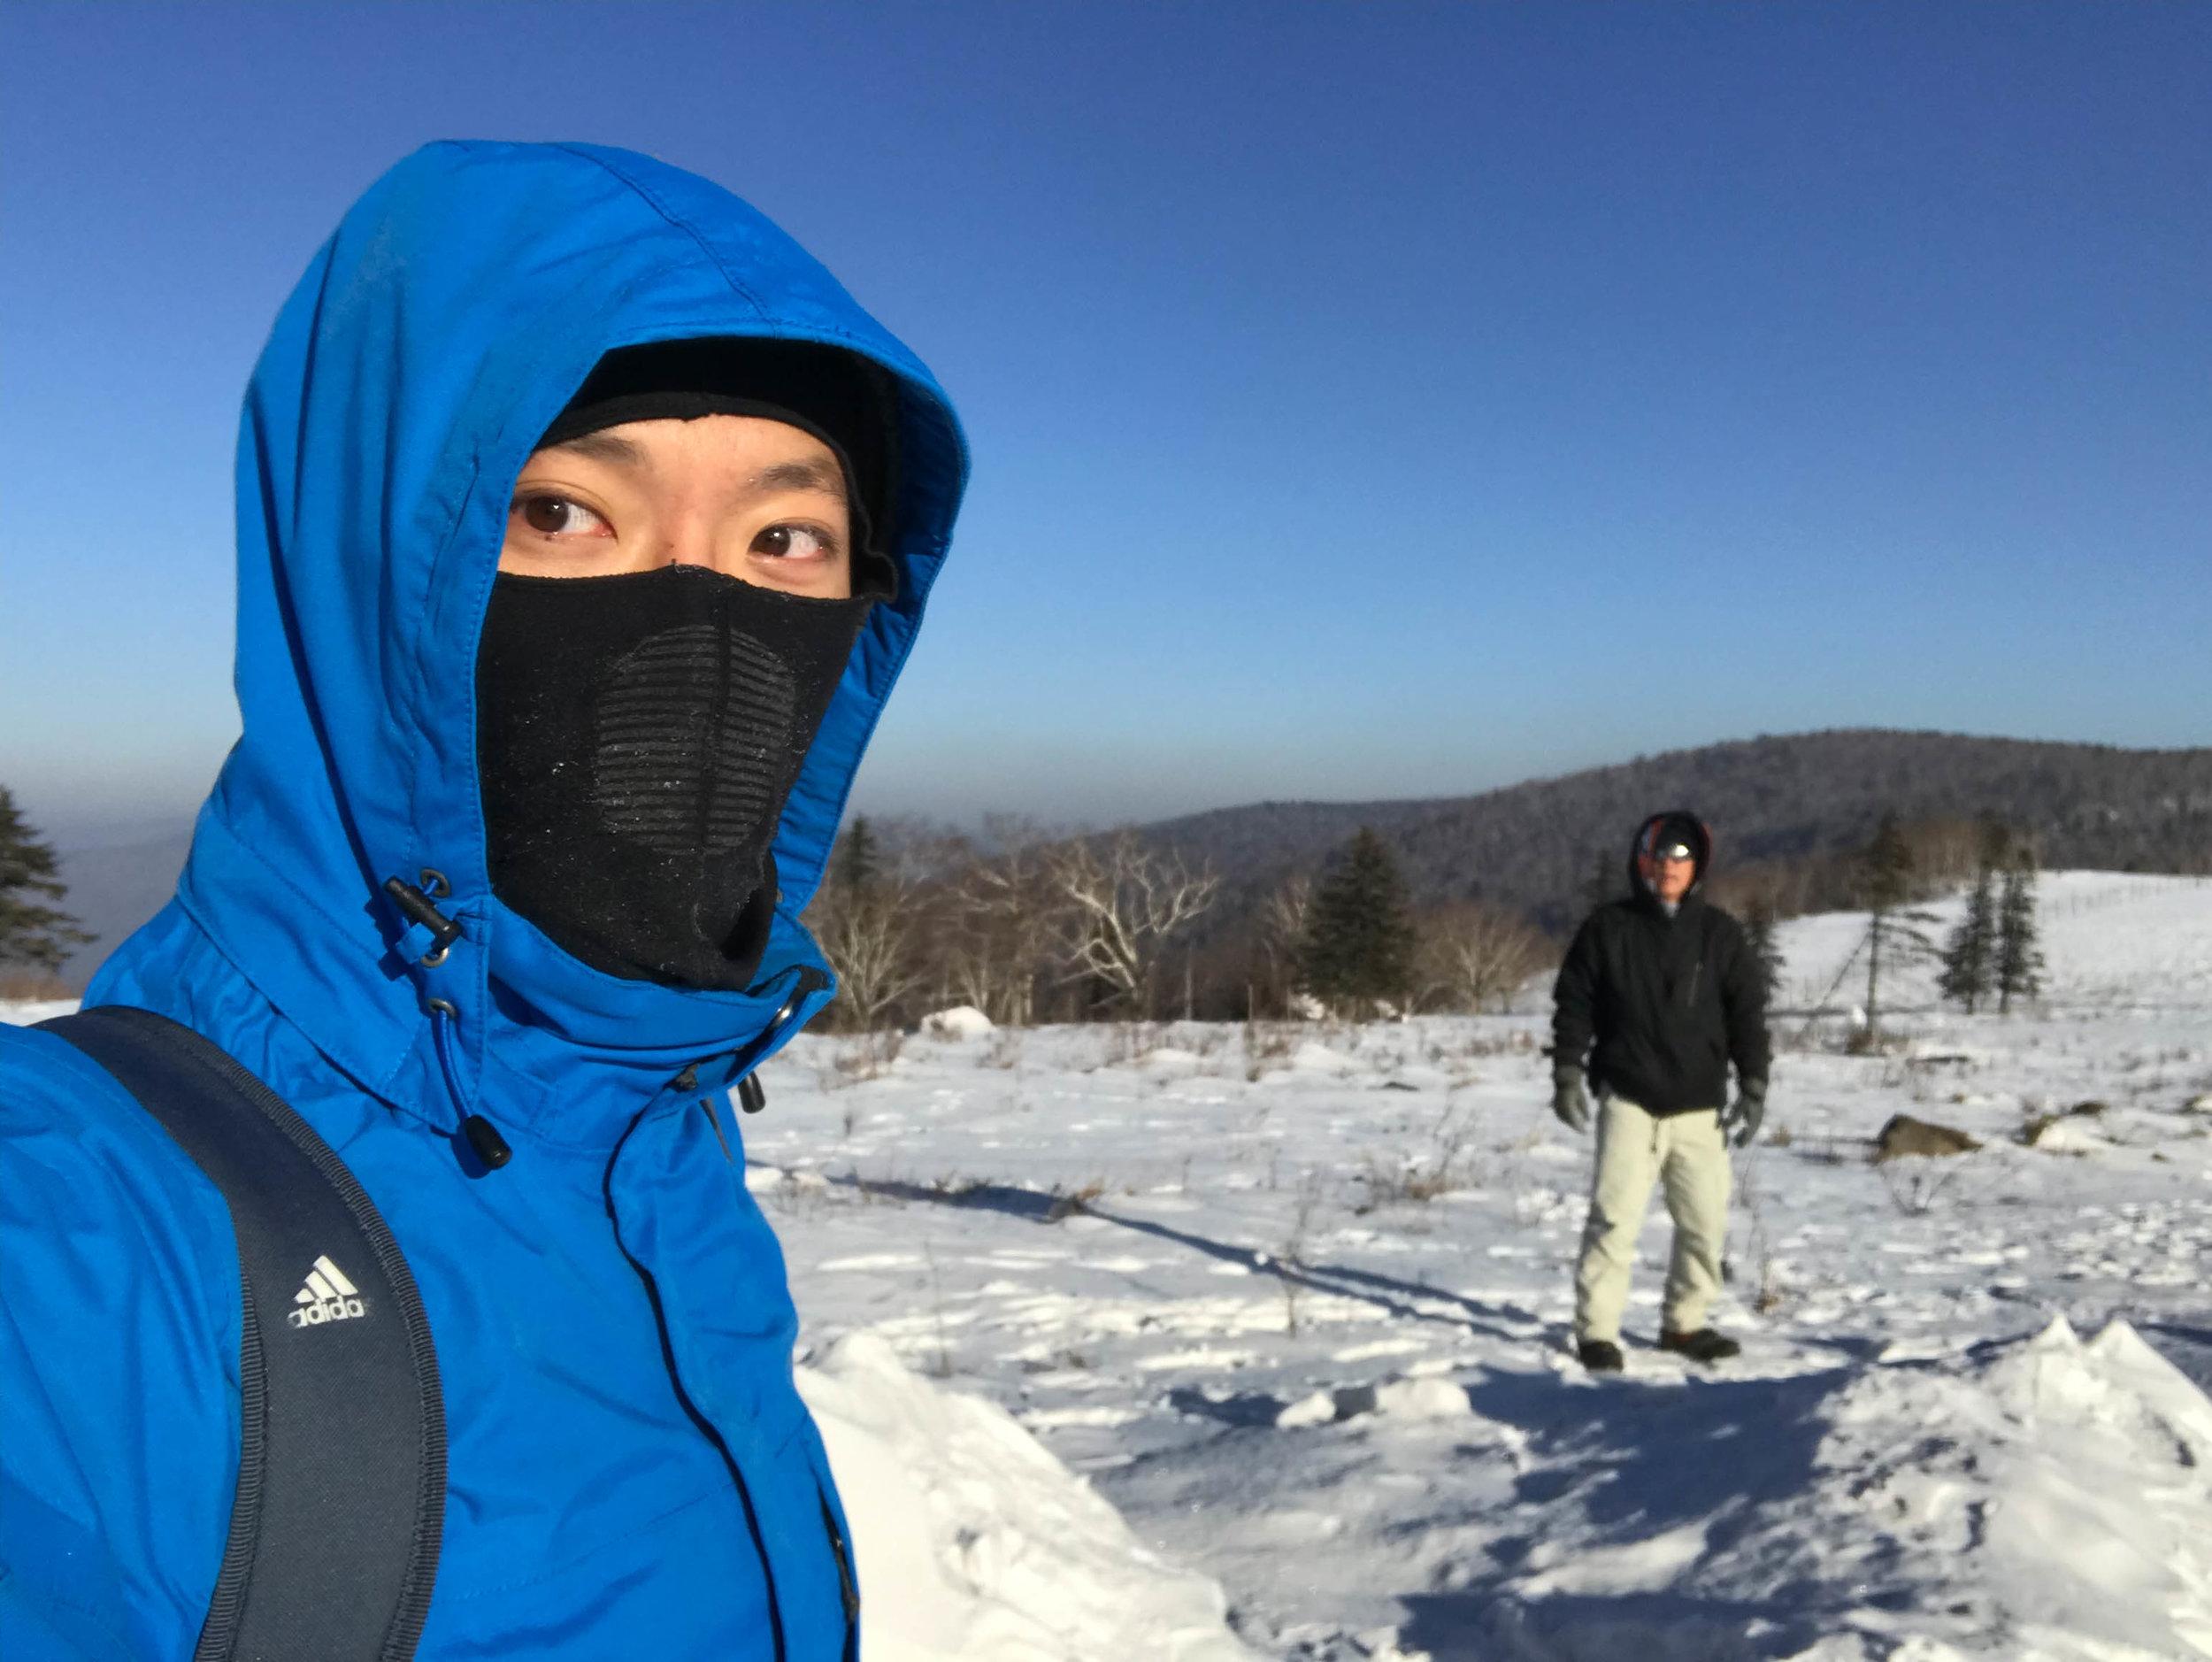 Trekking in sub-zero Harbin snow.